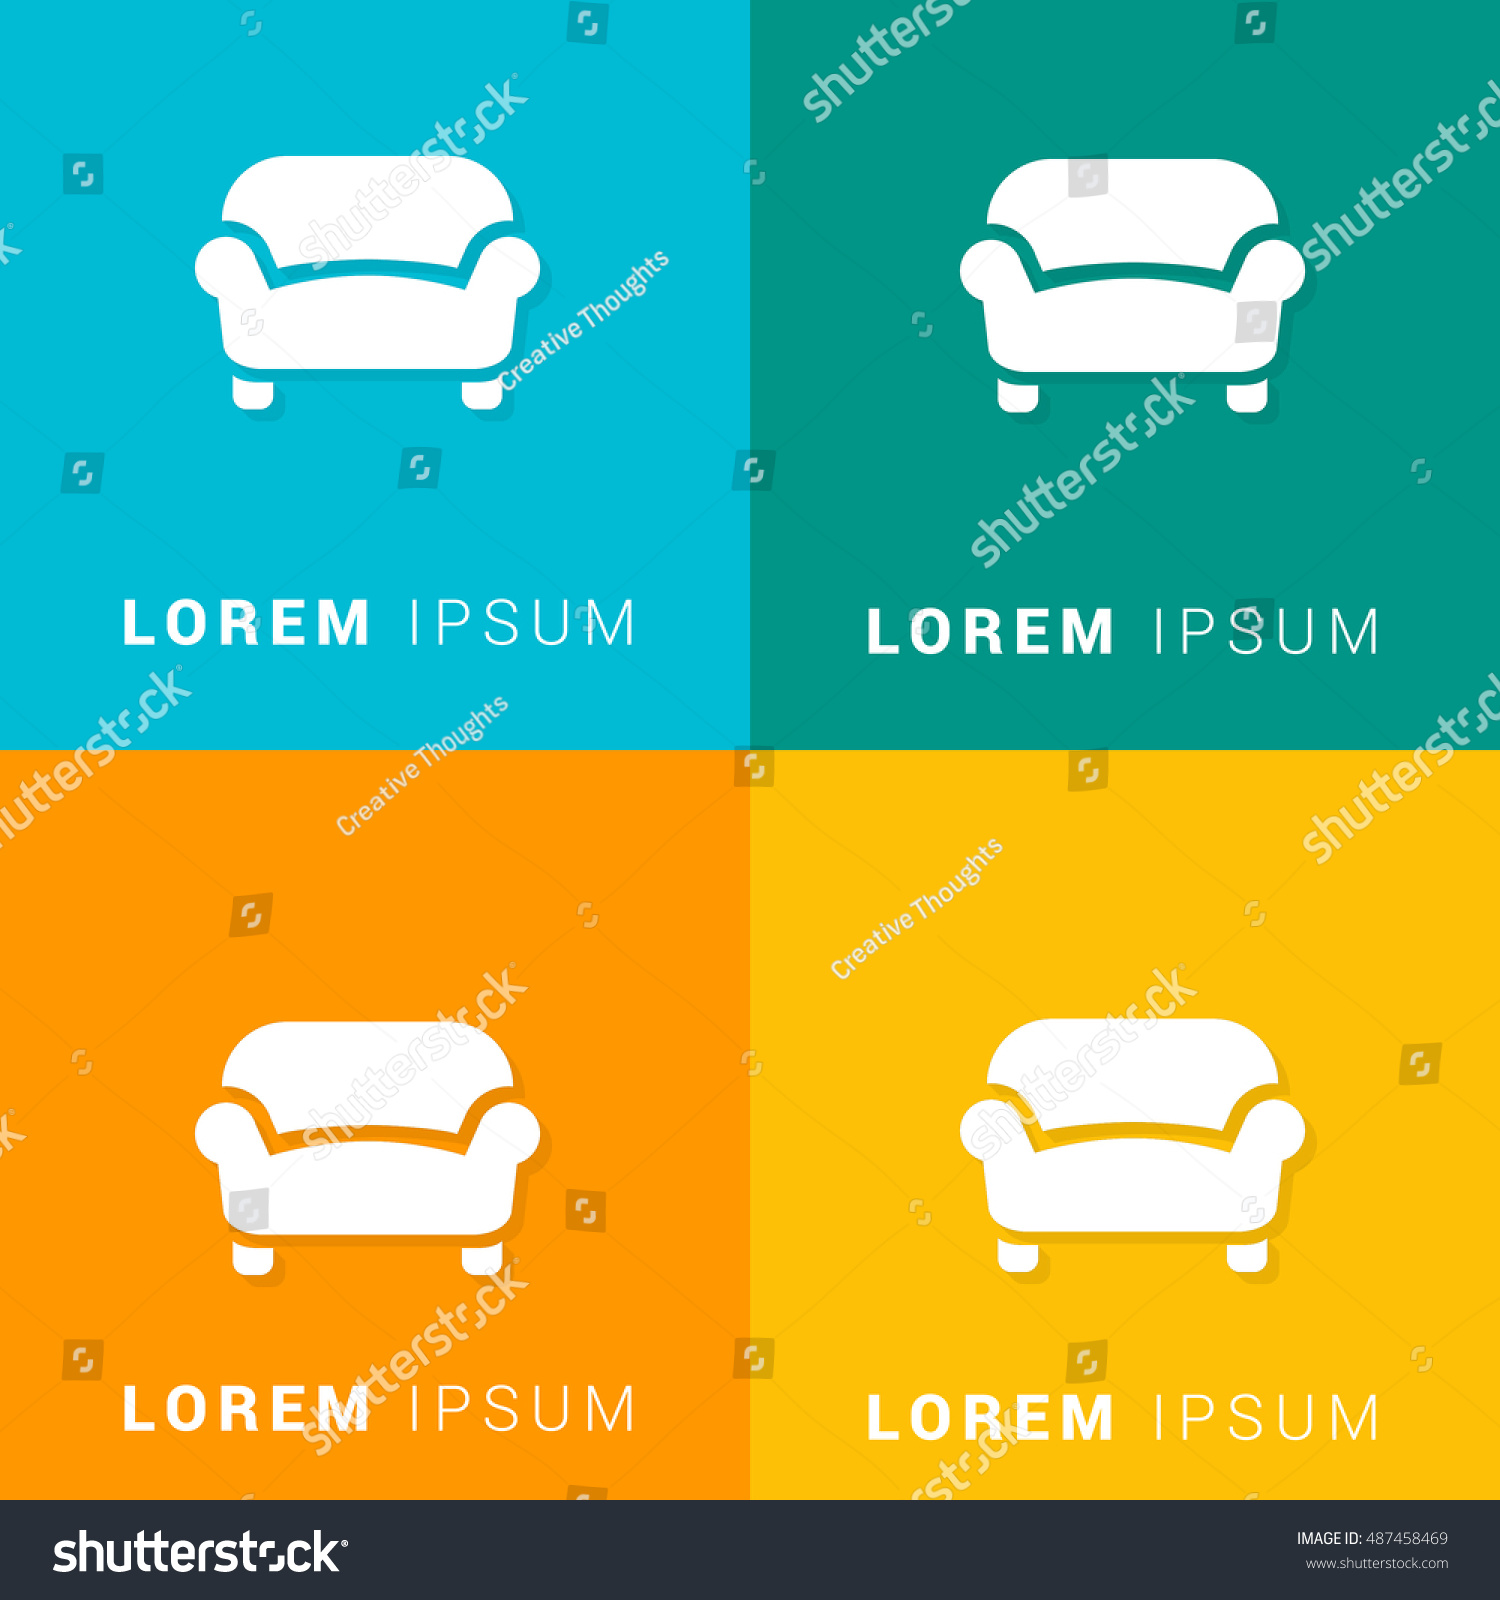 Sofa Four Color Material Designed Icon Stock Vector 487458469 ...